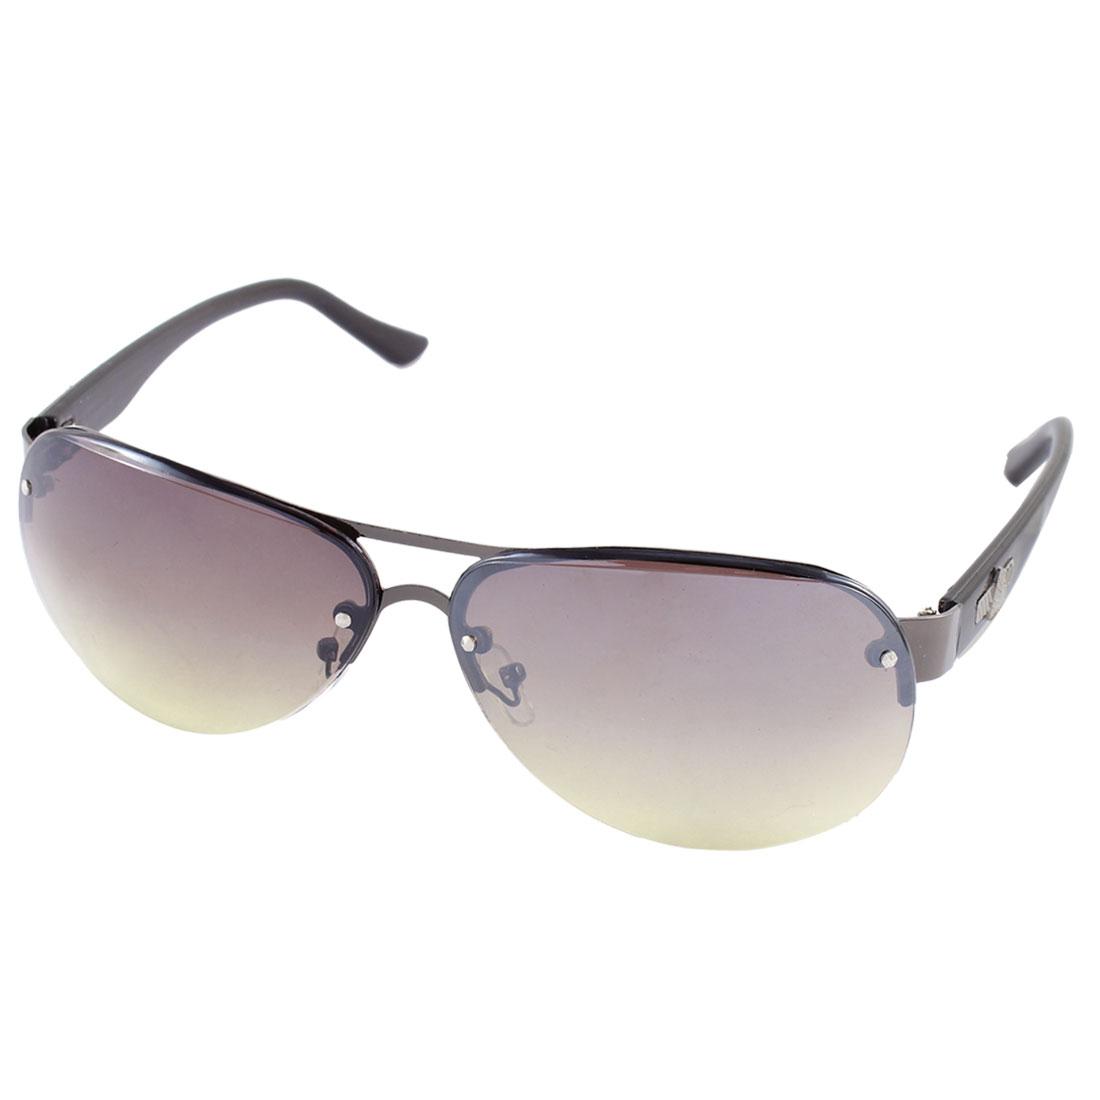 Unisex Plastic Half Rim Sunglasses Outdoor Driving Eyewear Protector